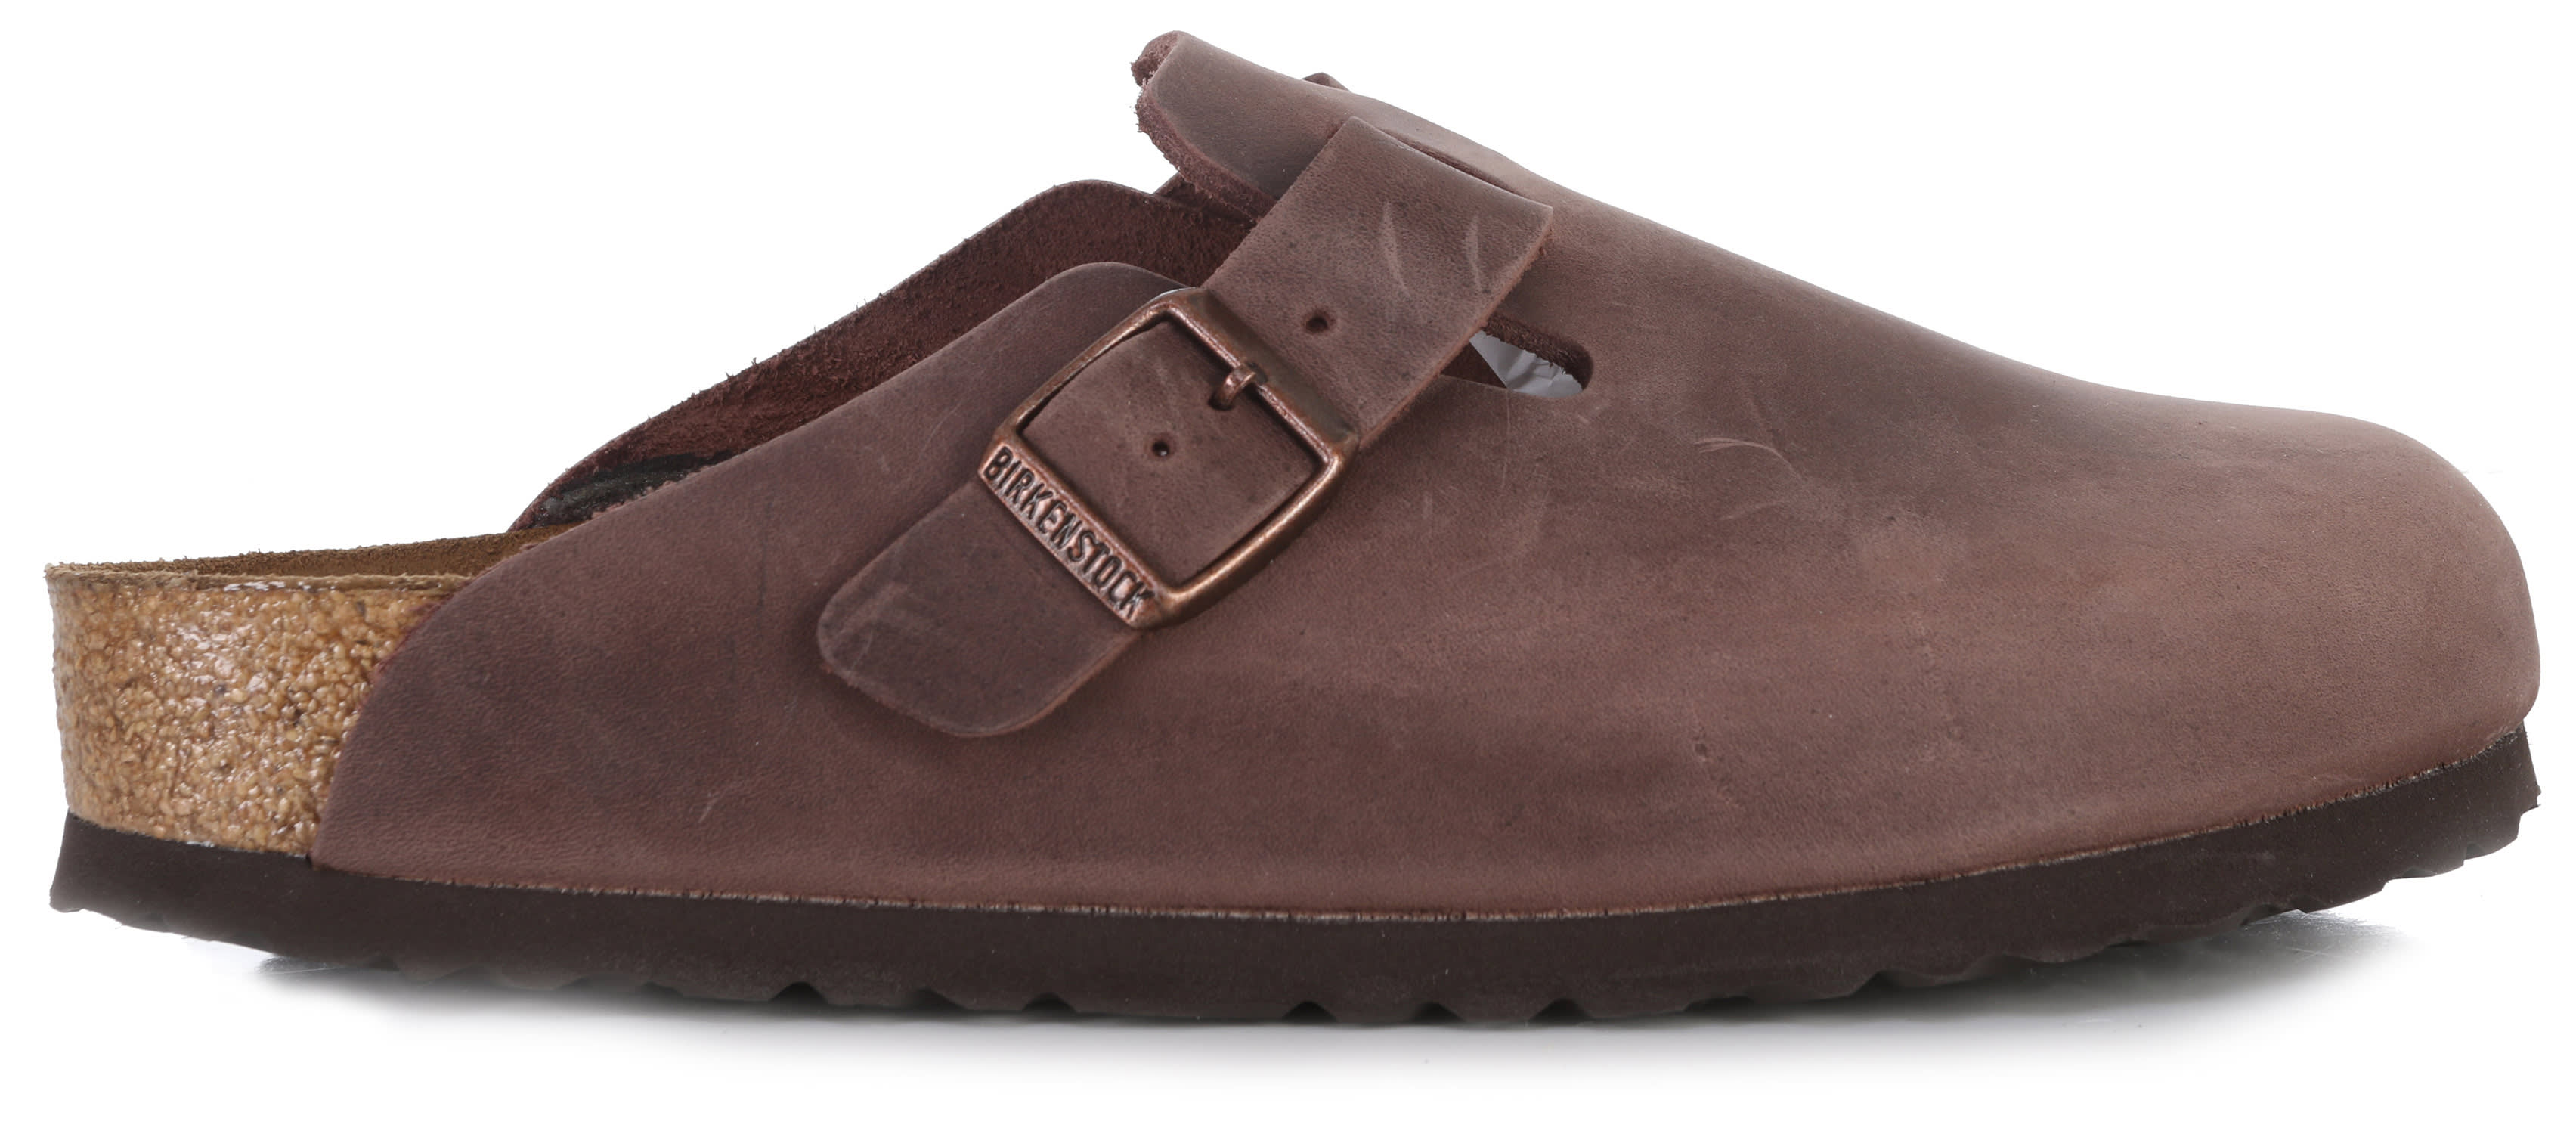 Image of Birkenstock Boston Soft Footbed Clogs